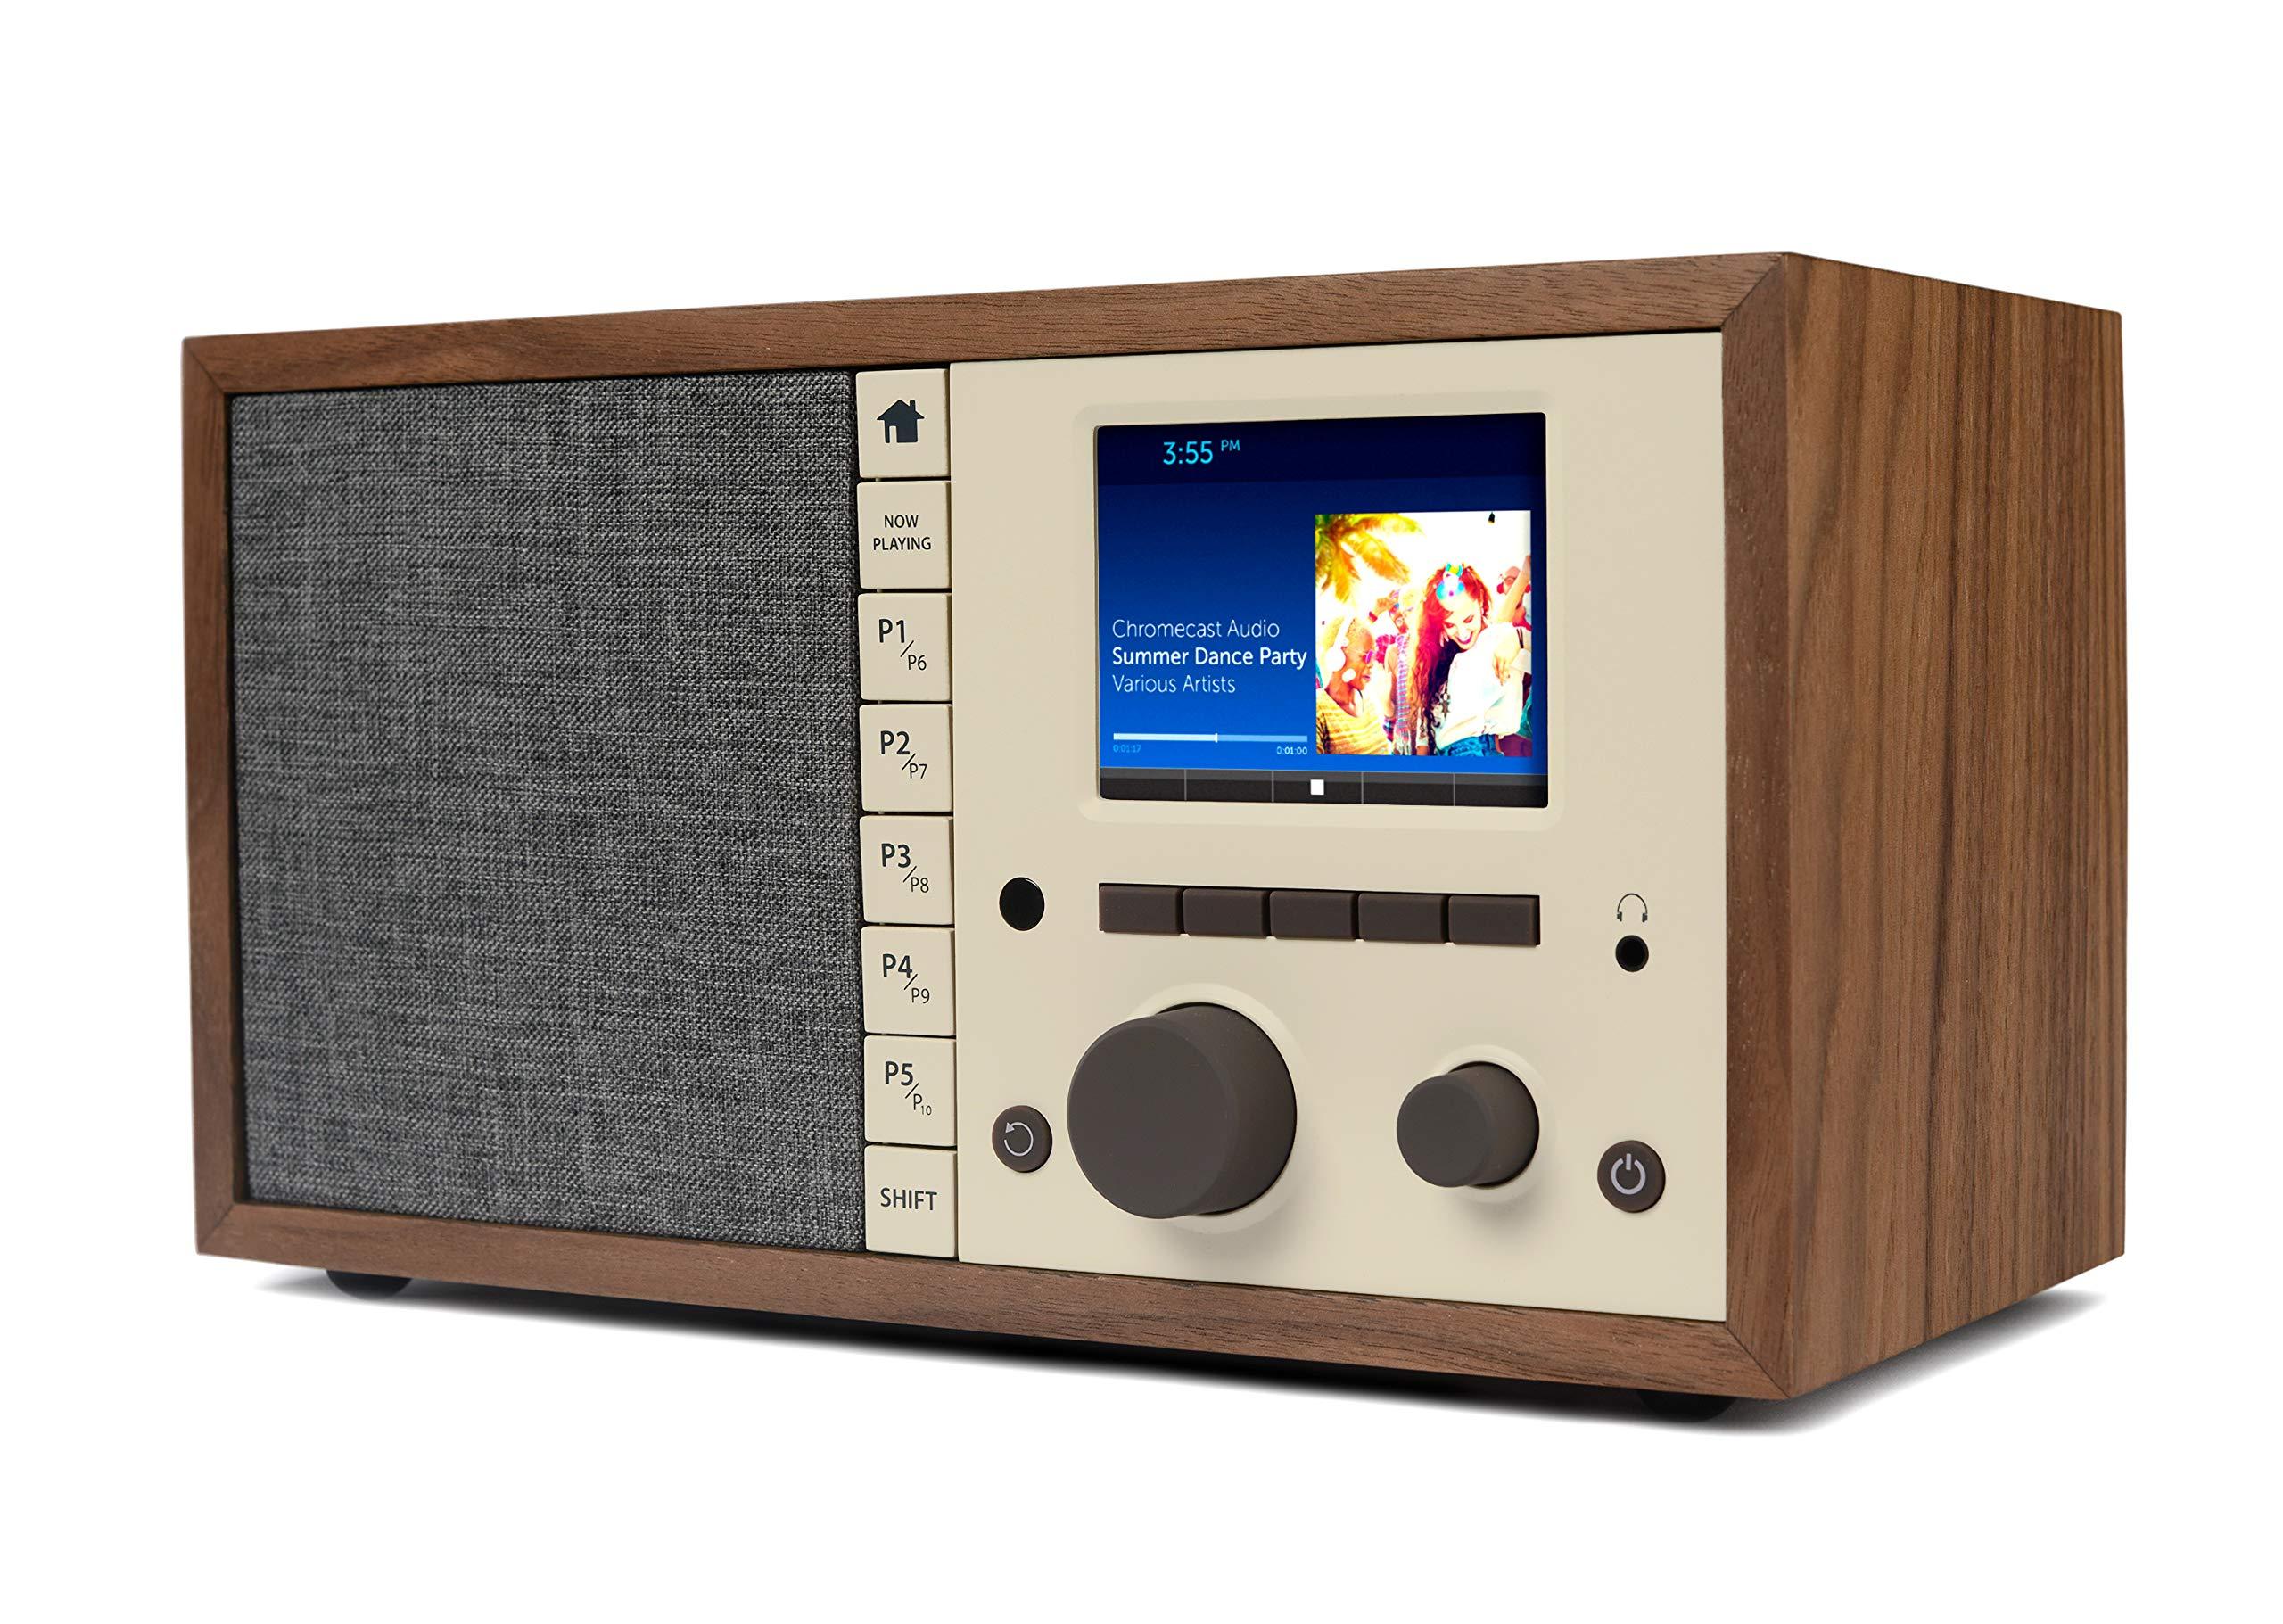 Grace Digital Mondo+ Classic Wireless Internet Radio with Wi-Fi, Bluetooth and Qi Built-in Wireless Smartphone Charger Walnut (GDI-WHA6005) by Grace Digital